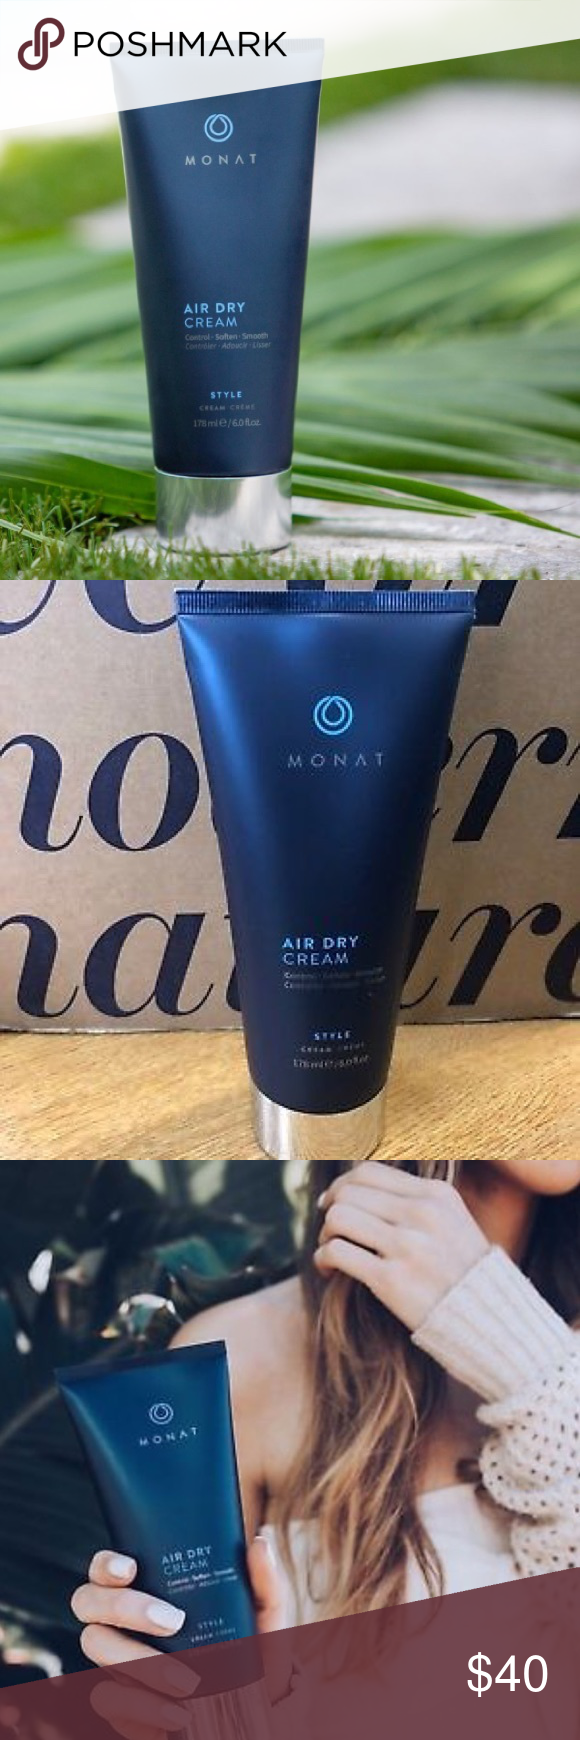 Monat Air Dry Cream— Control, Soften, Smooth Air dry